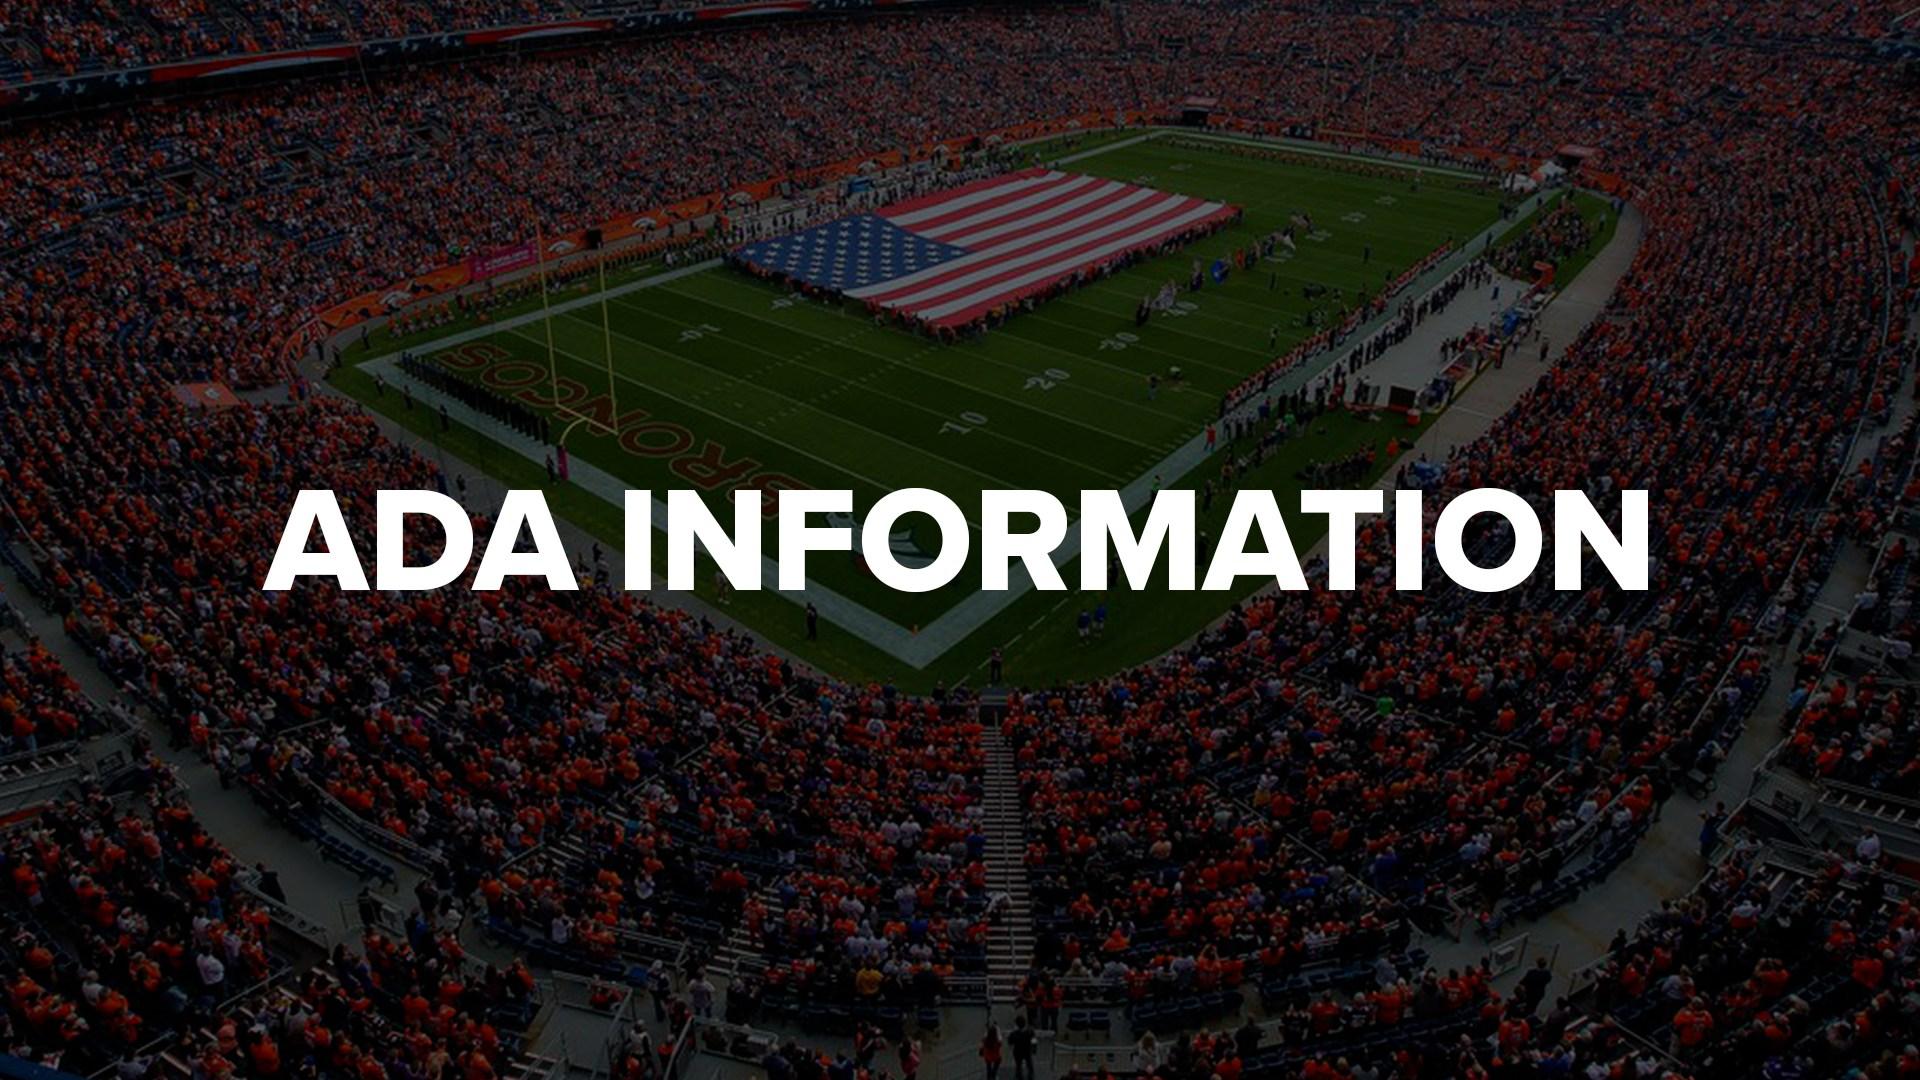 ADA information